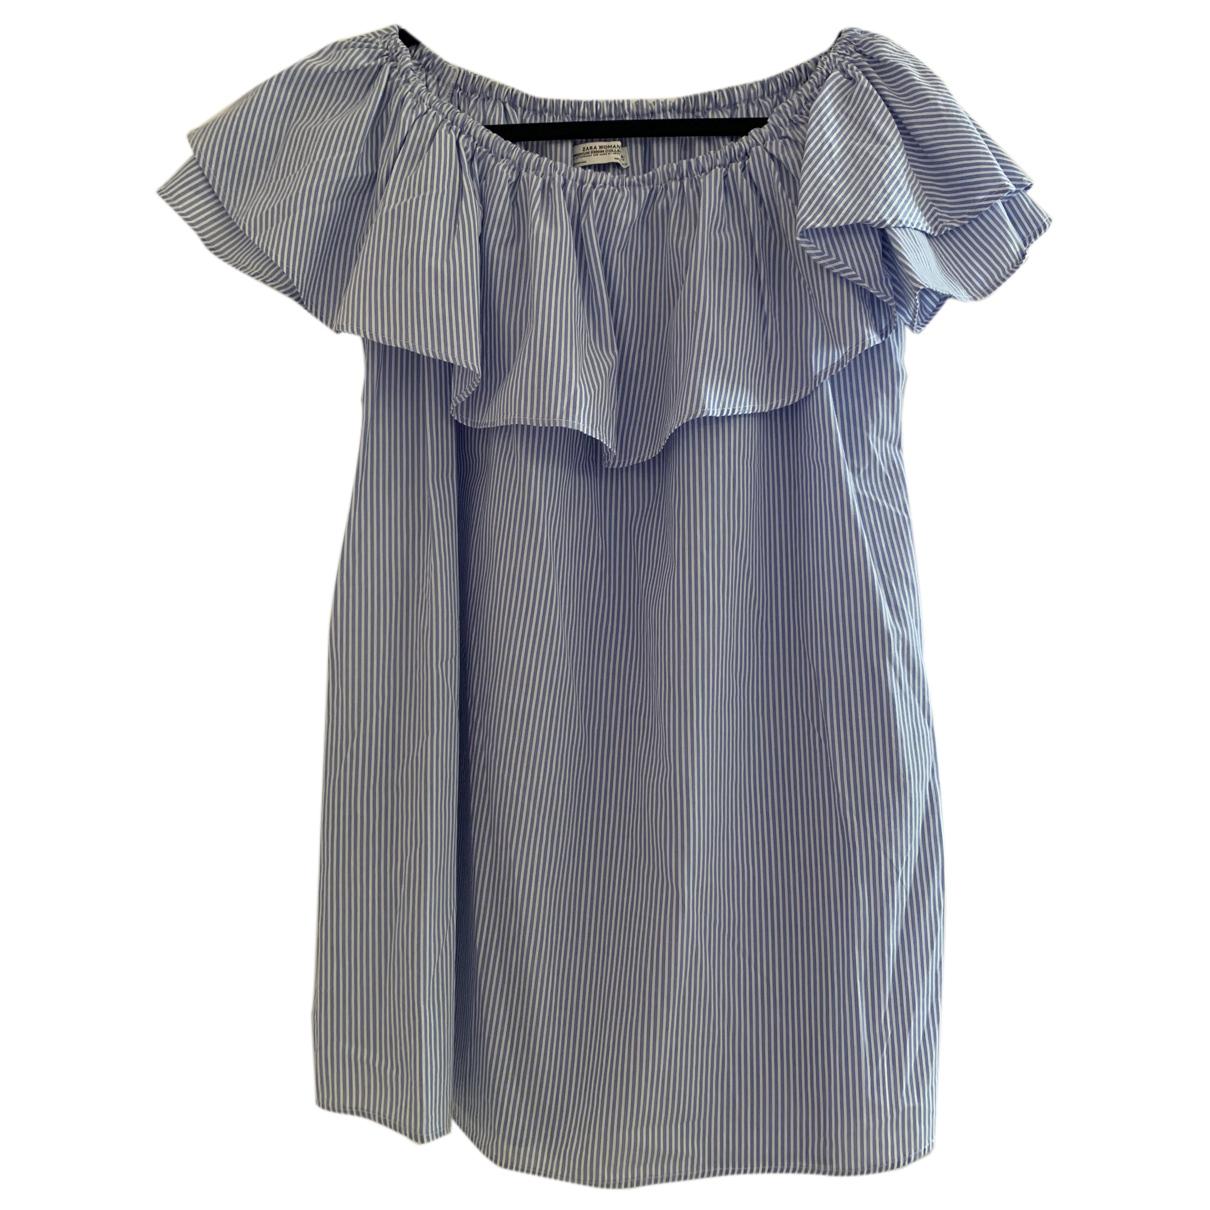 Zara - Robe   pour femme - bleu